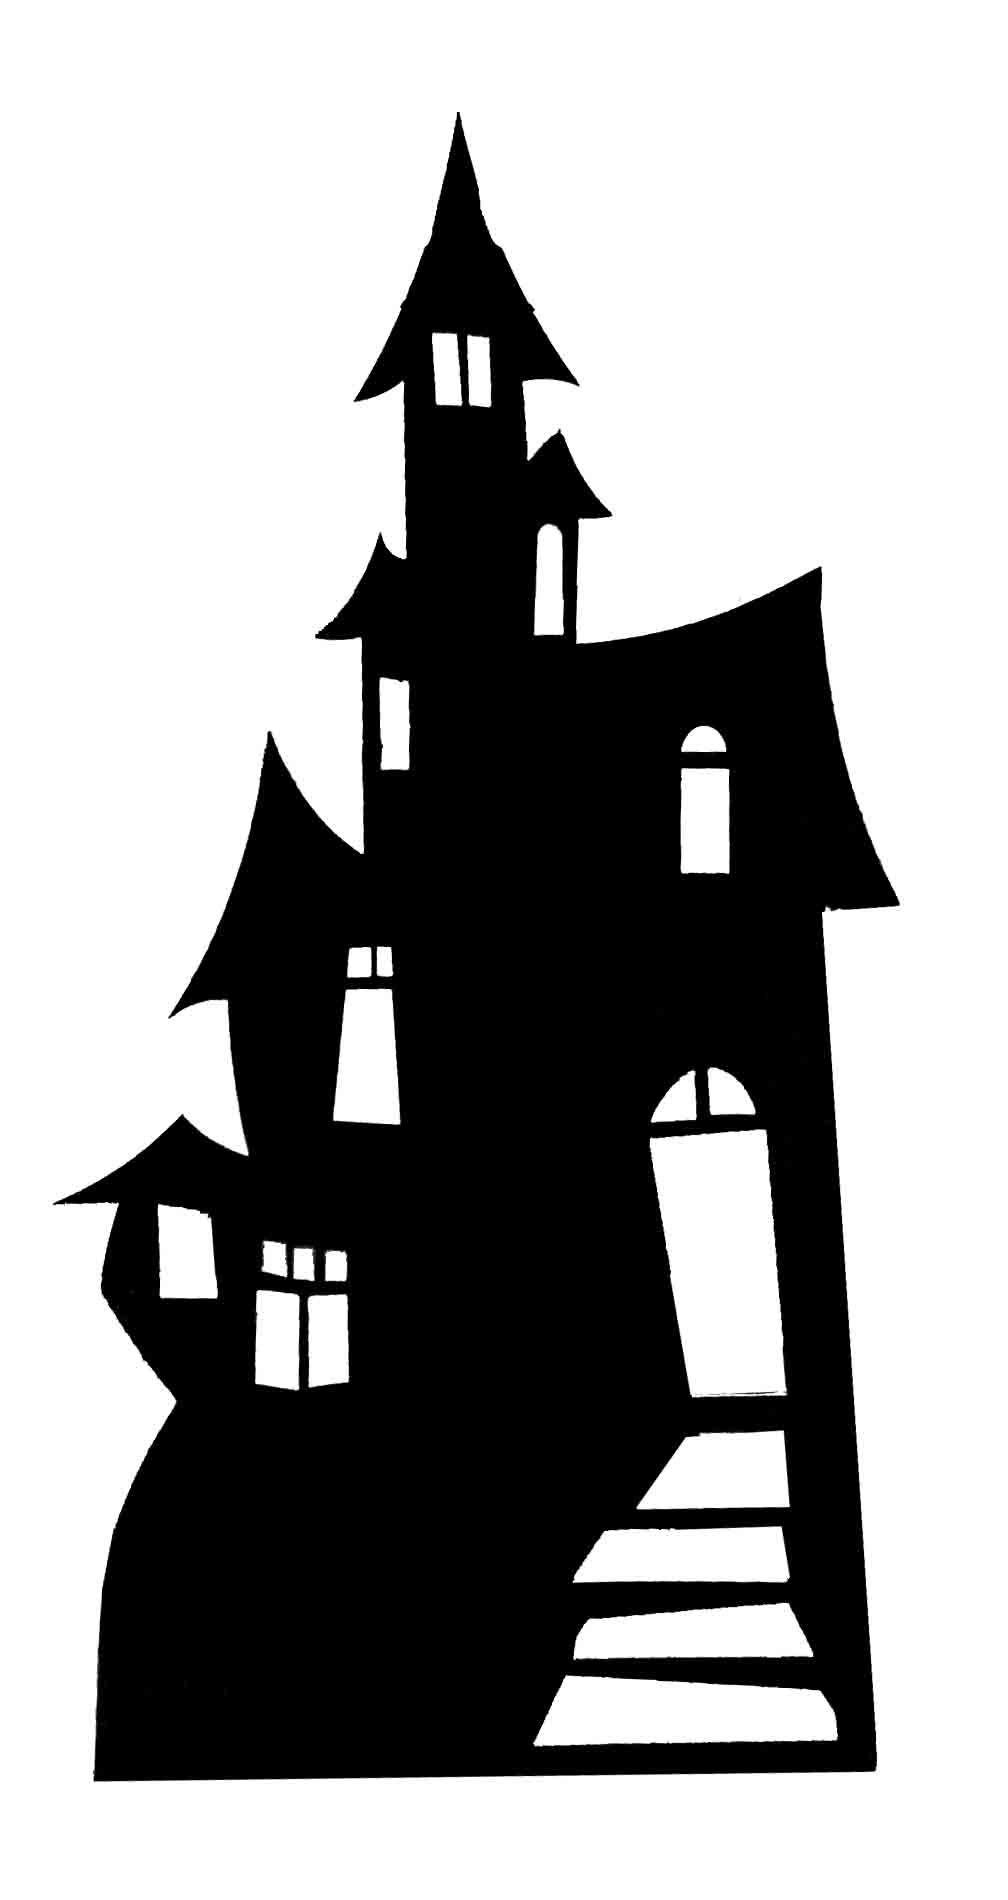 Afficher L Image D Origine Halloween Silhouettes Halloween Haunted Houses Halloween Window